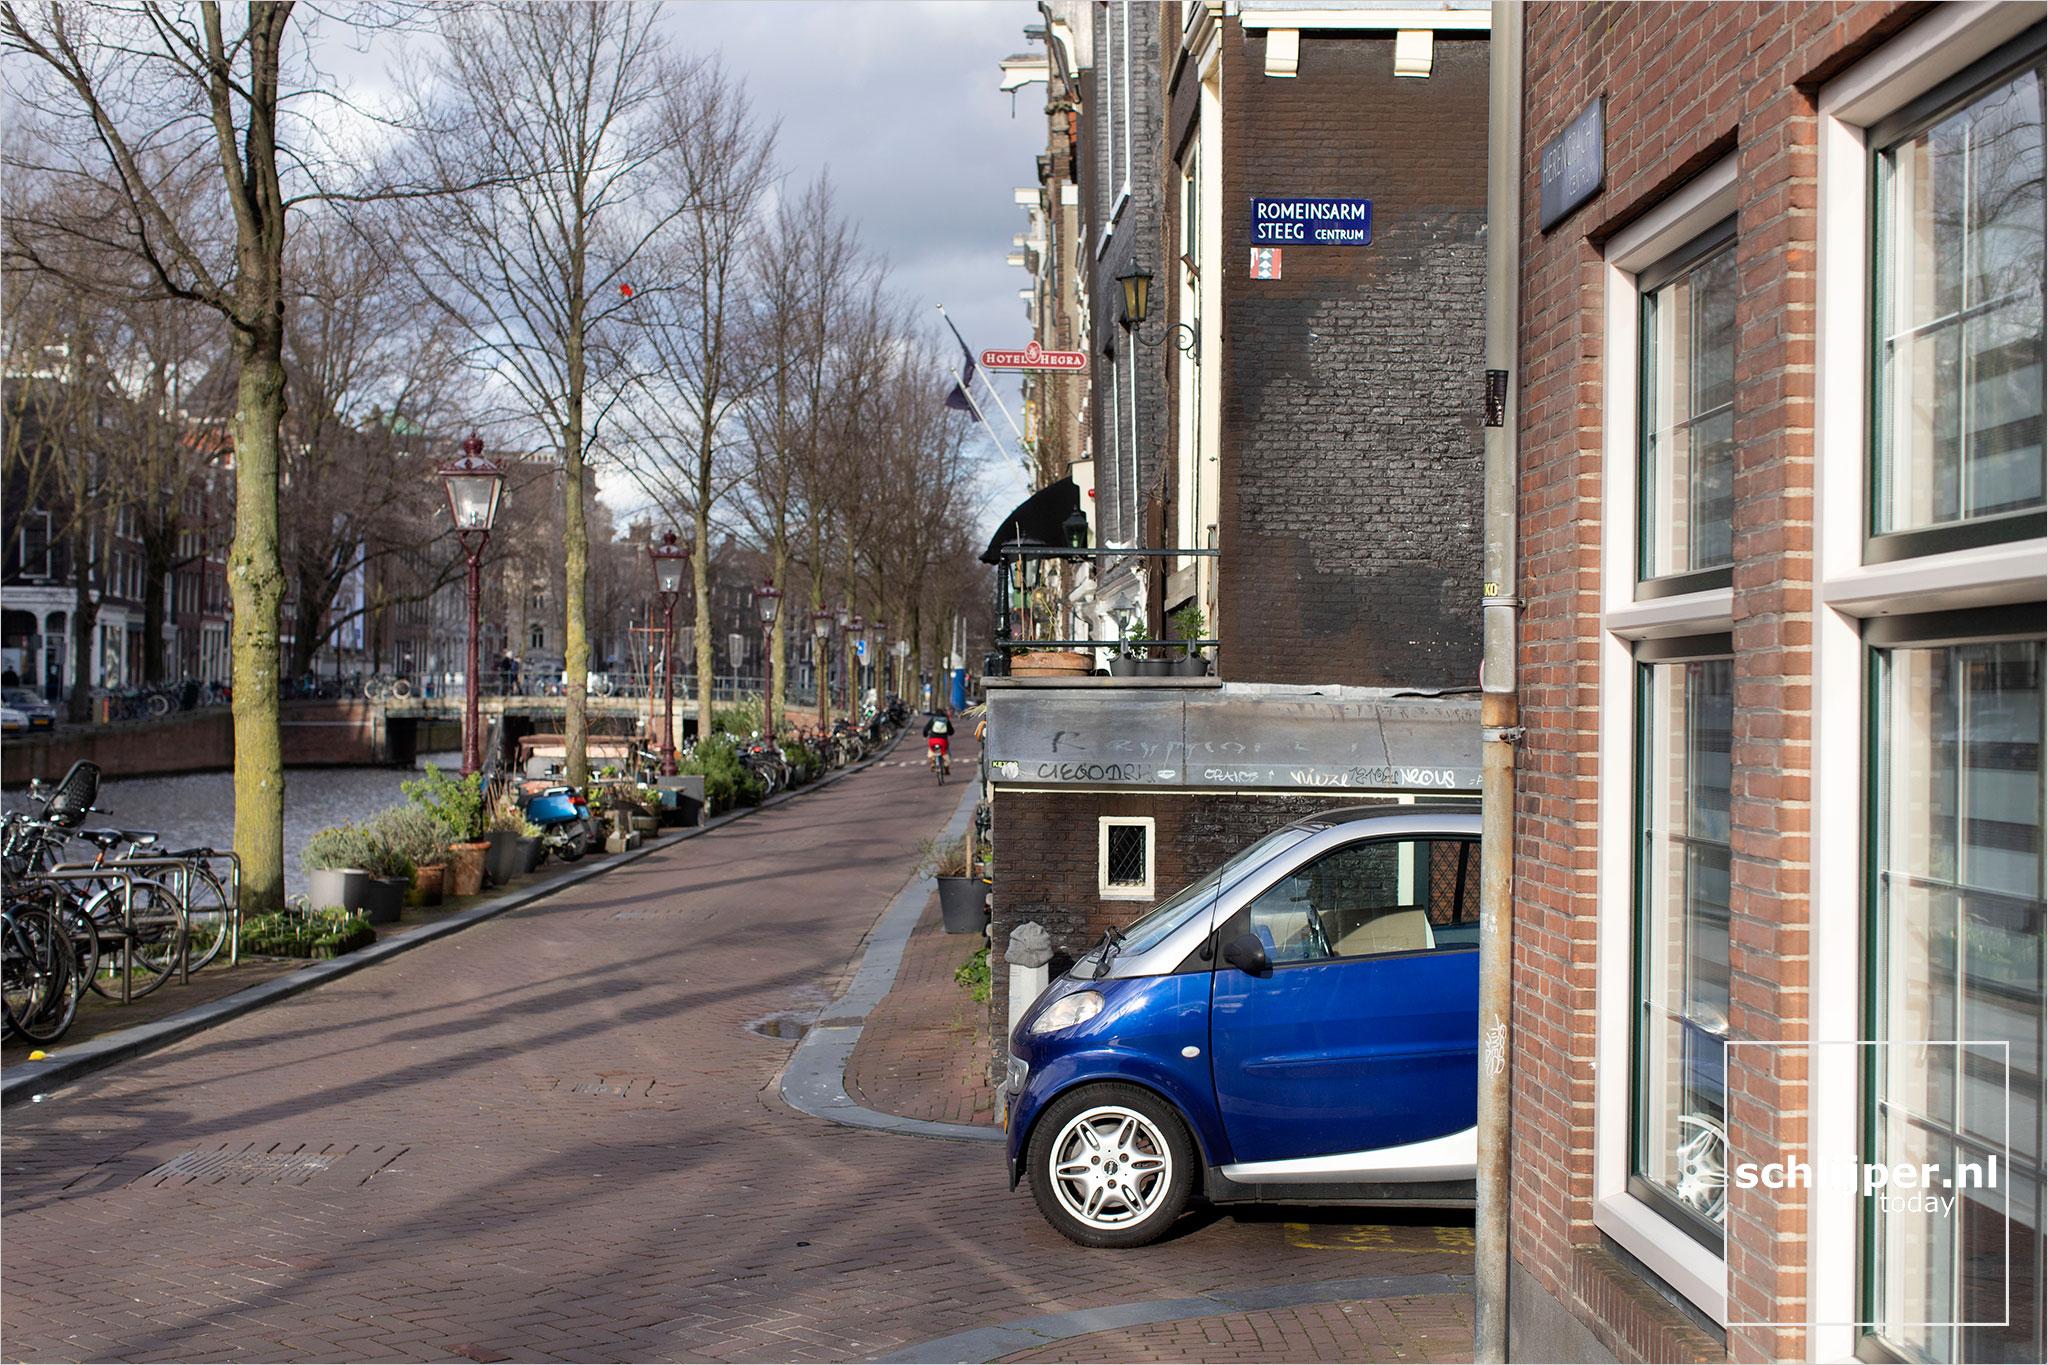 The Netherlands, Amsterdam, 21 januari 2021